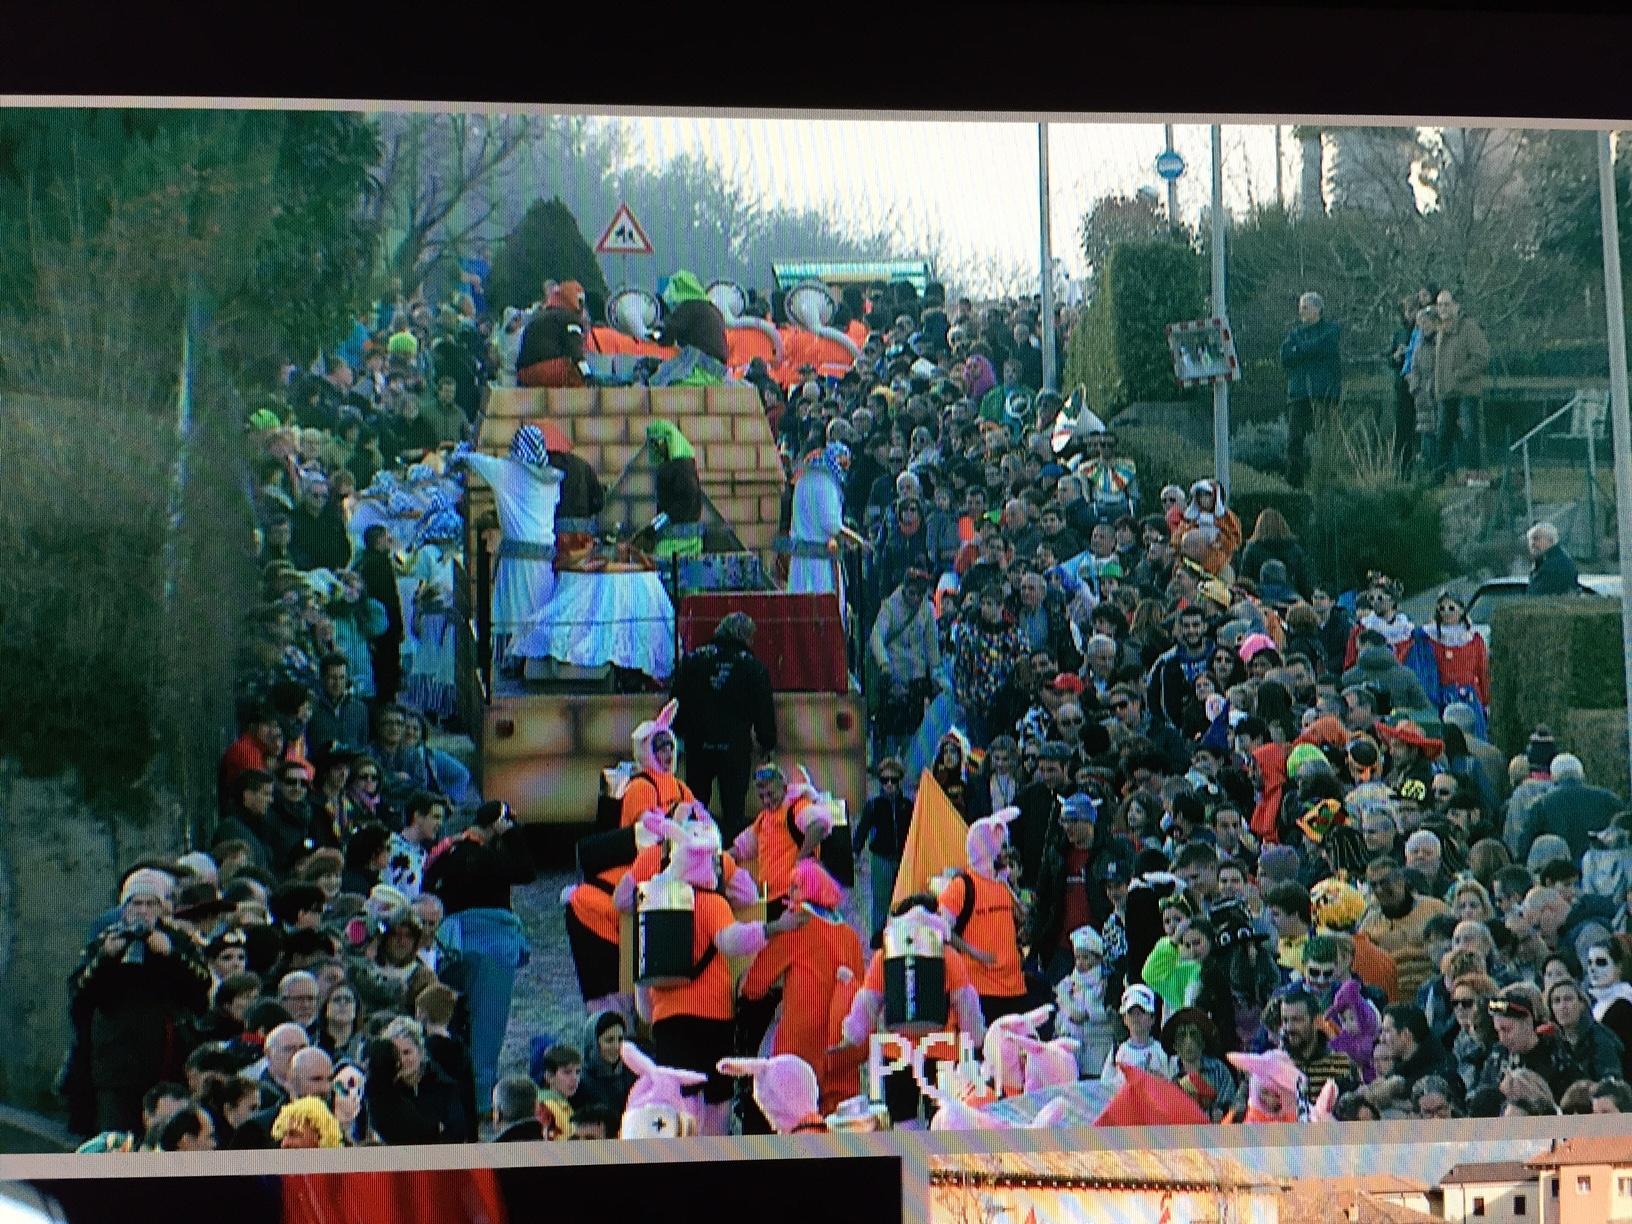 Carnevale Novazzano 2016